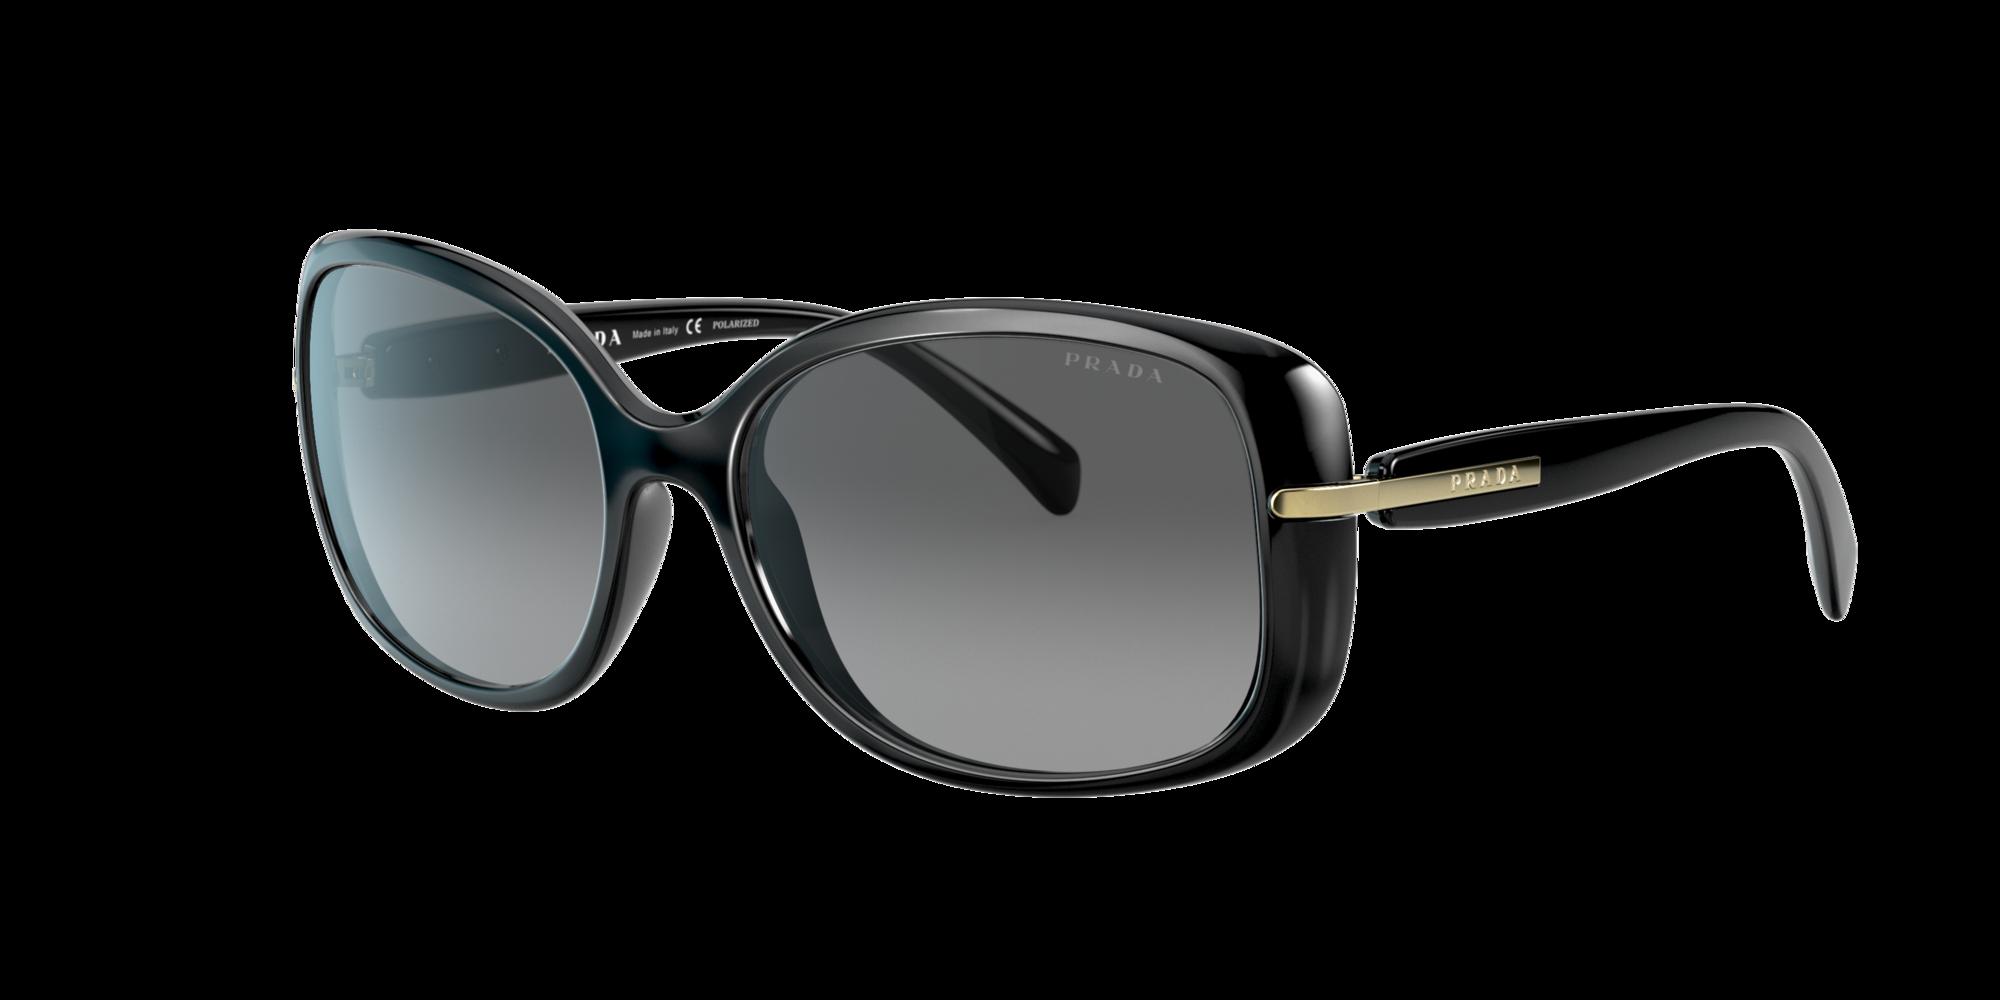 Prada PR 08OS Woman's Black Frame Sunglasses with Polarized Grey Gradient Lenses